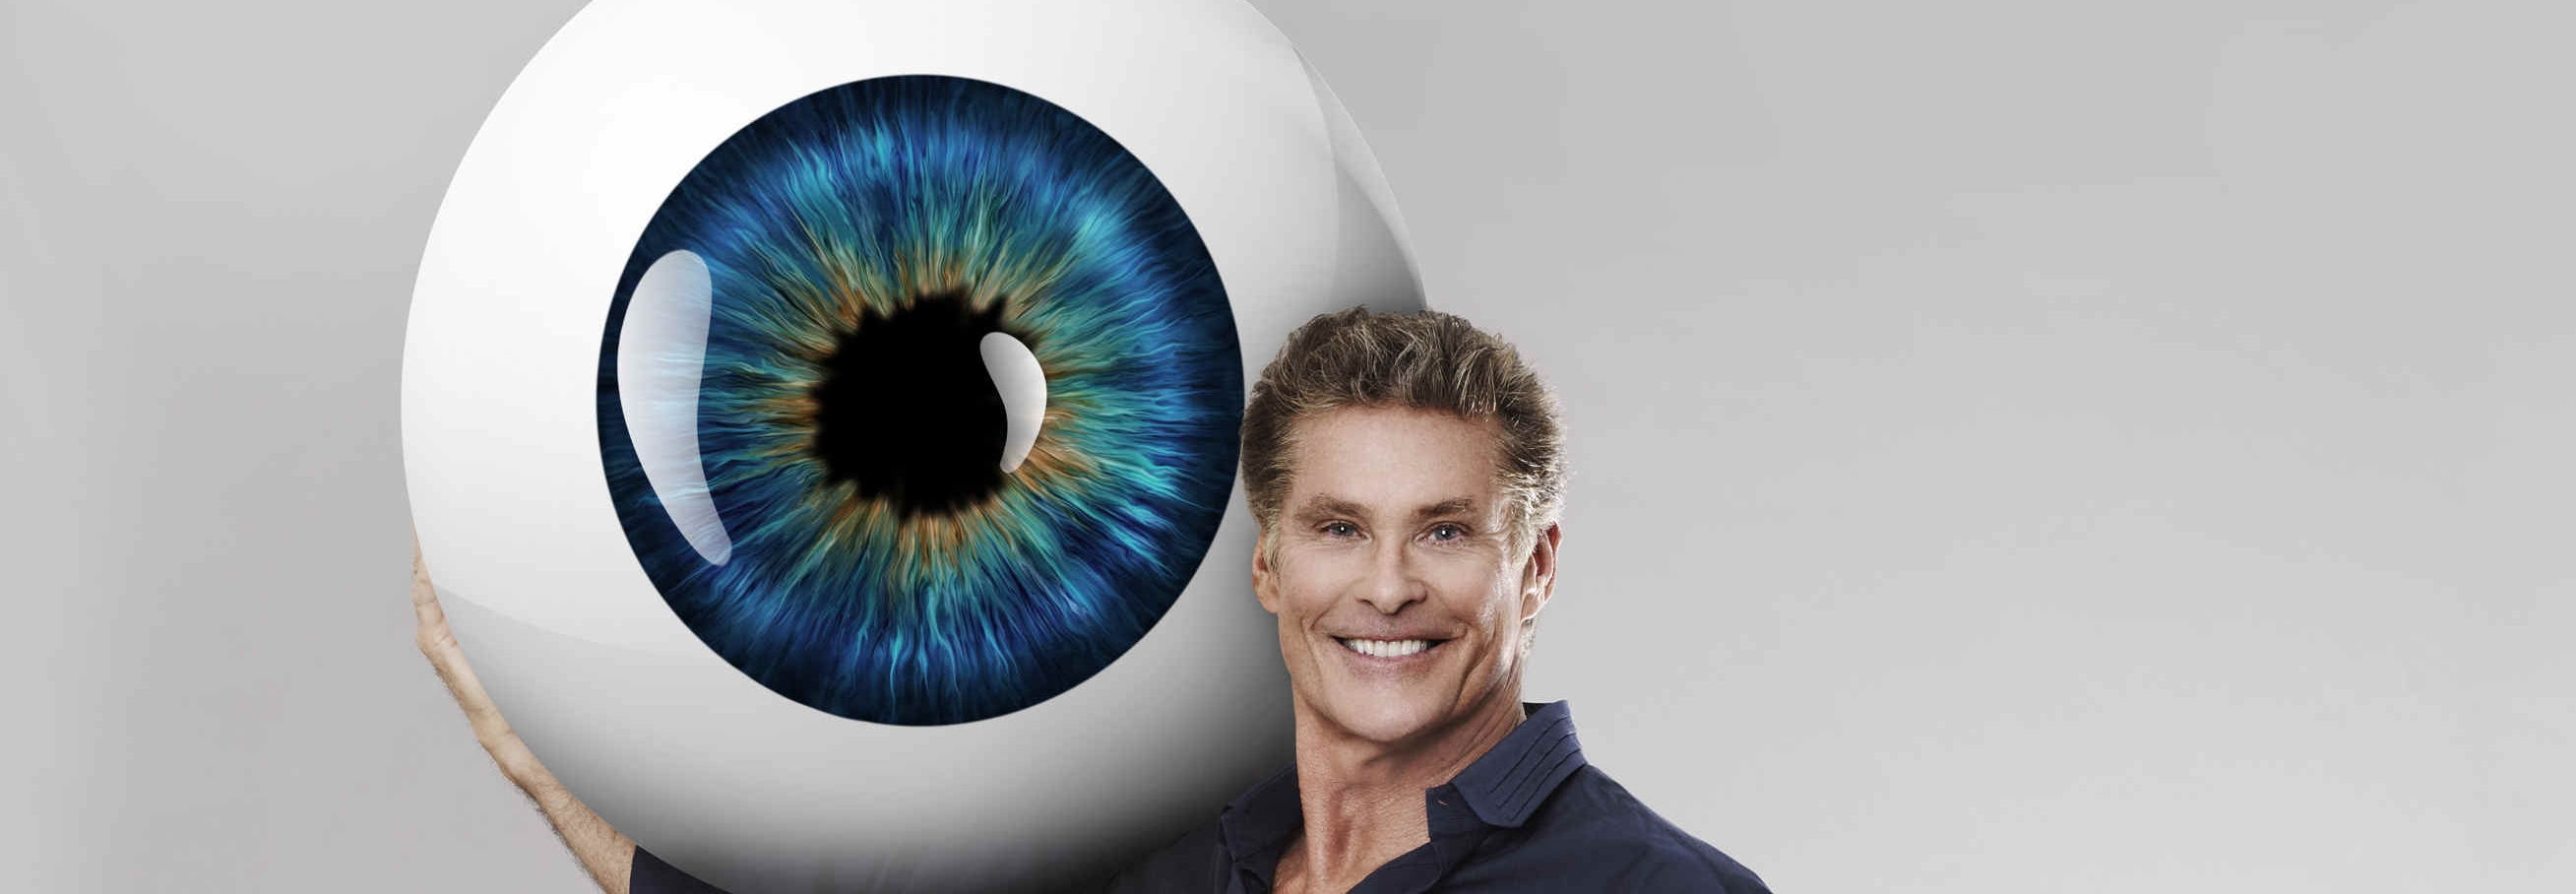 David Hasselhoff Promi Big Brother 2013 Auge